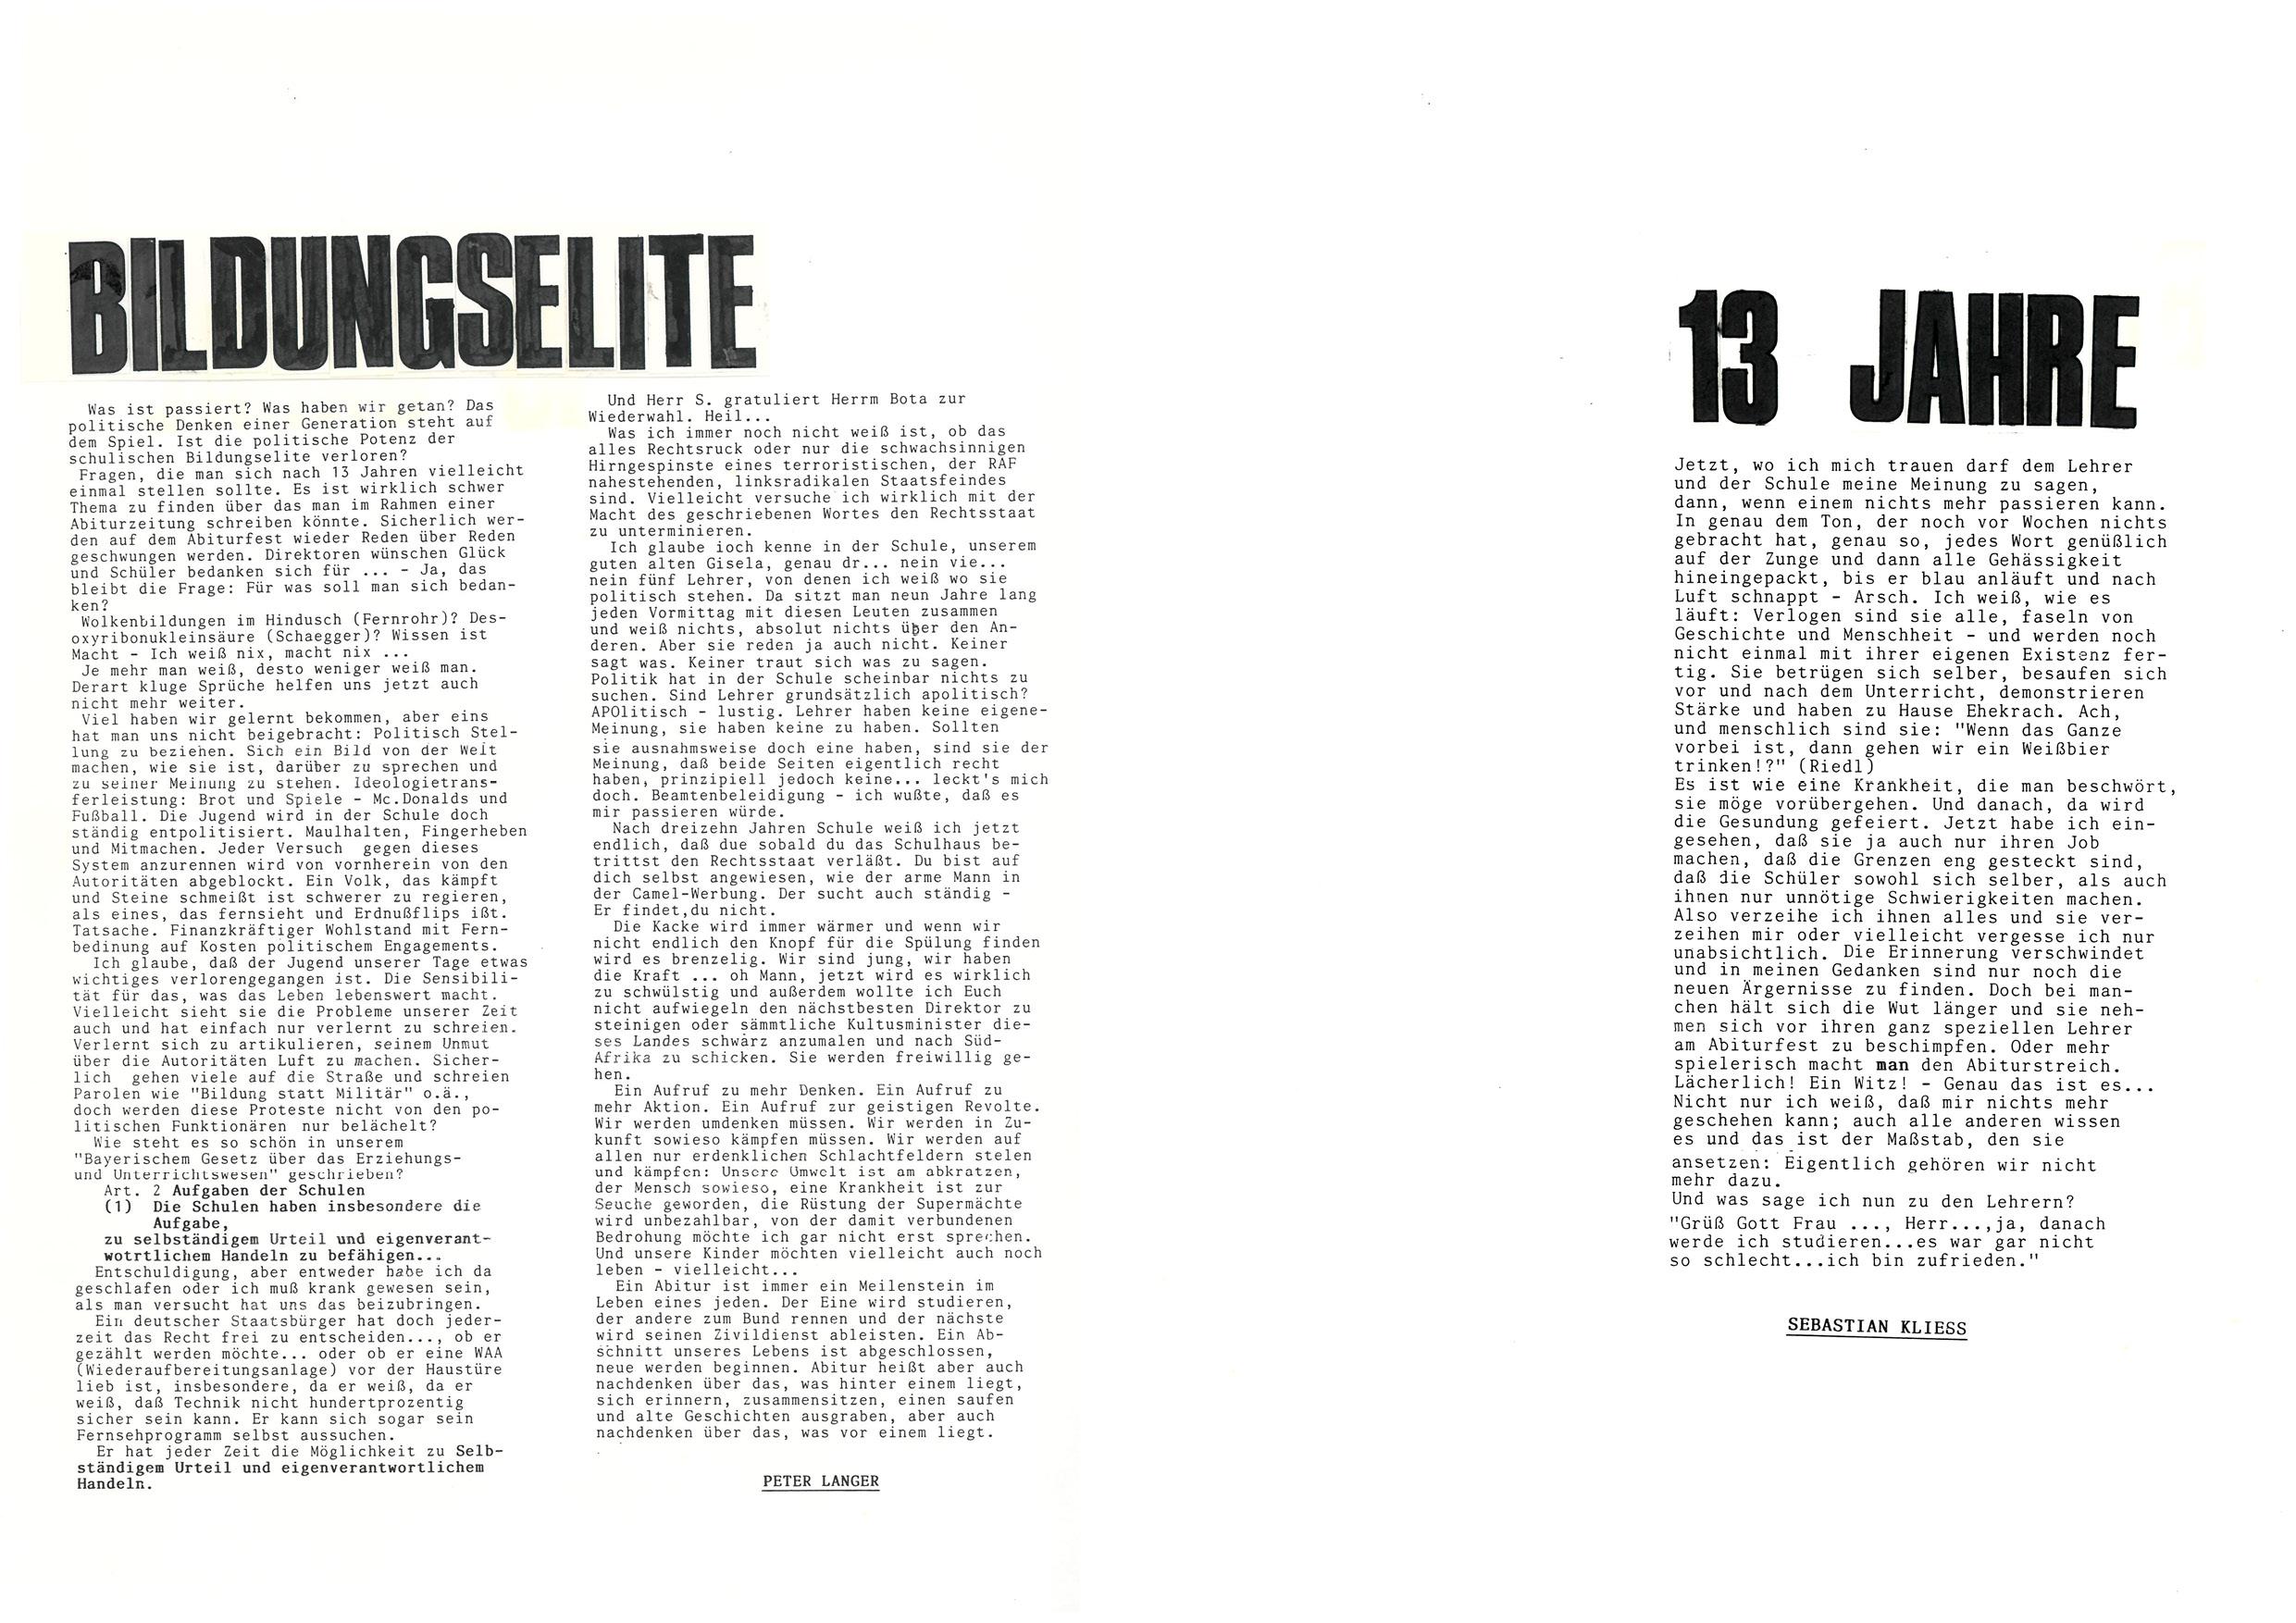 Abiturzeitung198706